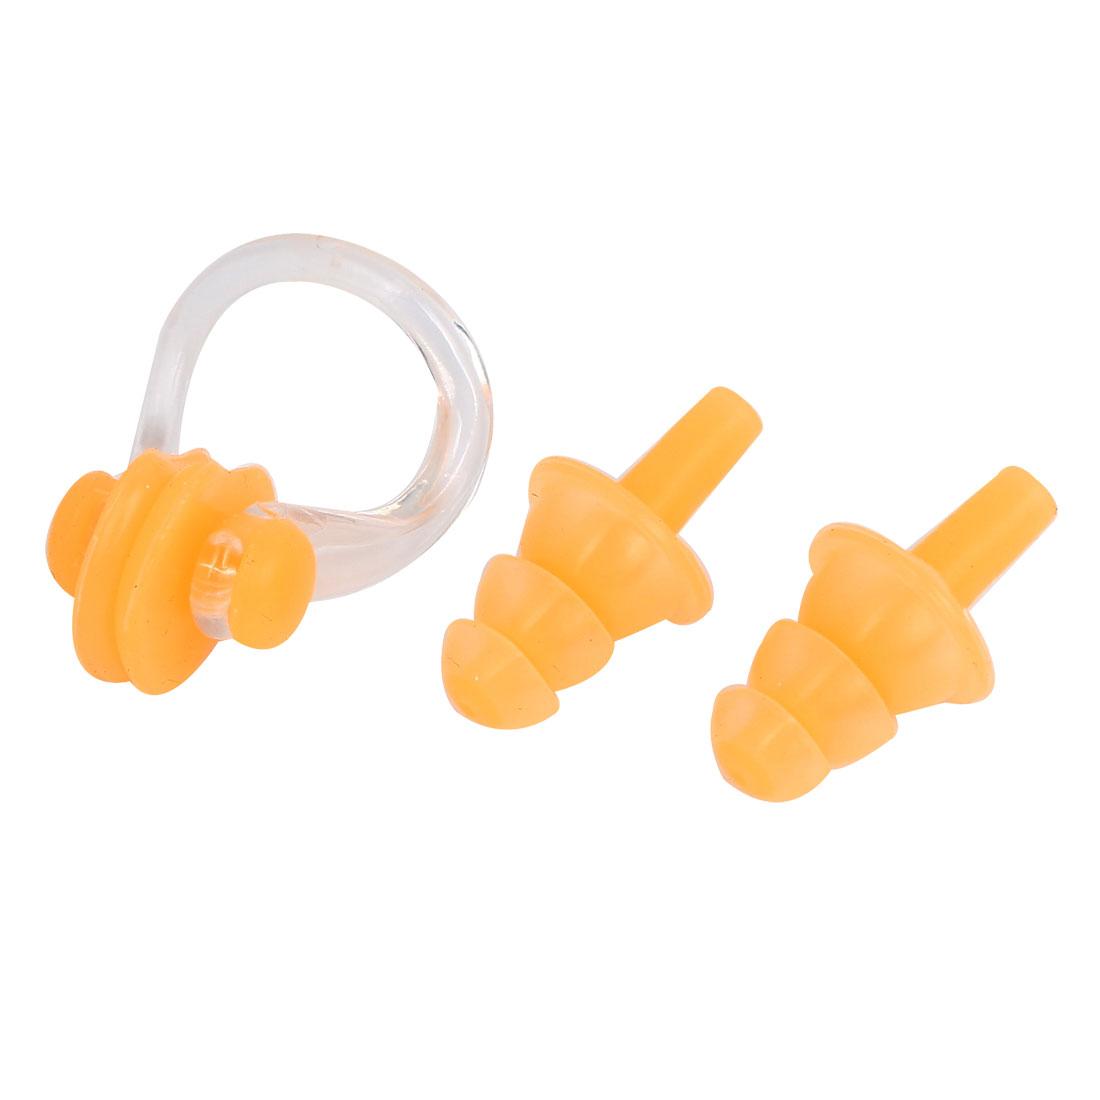 Swimming Water Sport Swim Protection Soft Earplugs Nose Clip Set Orange w Case